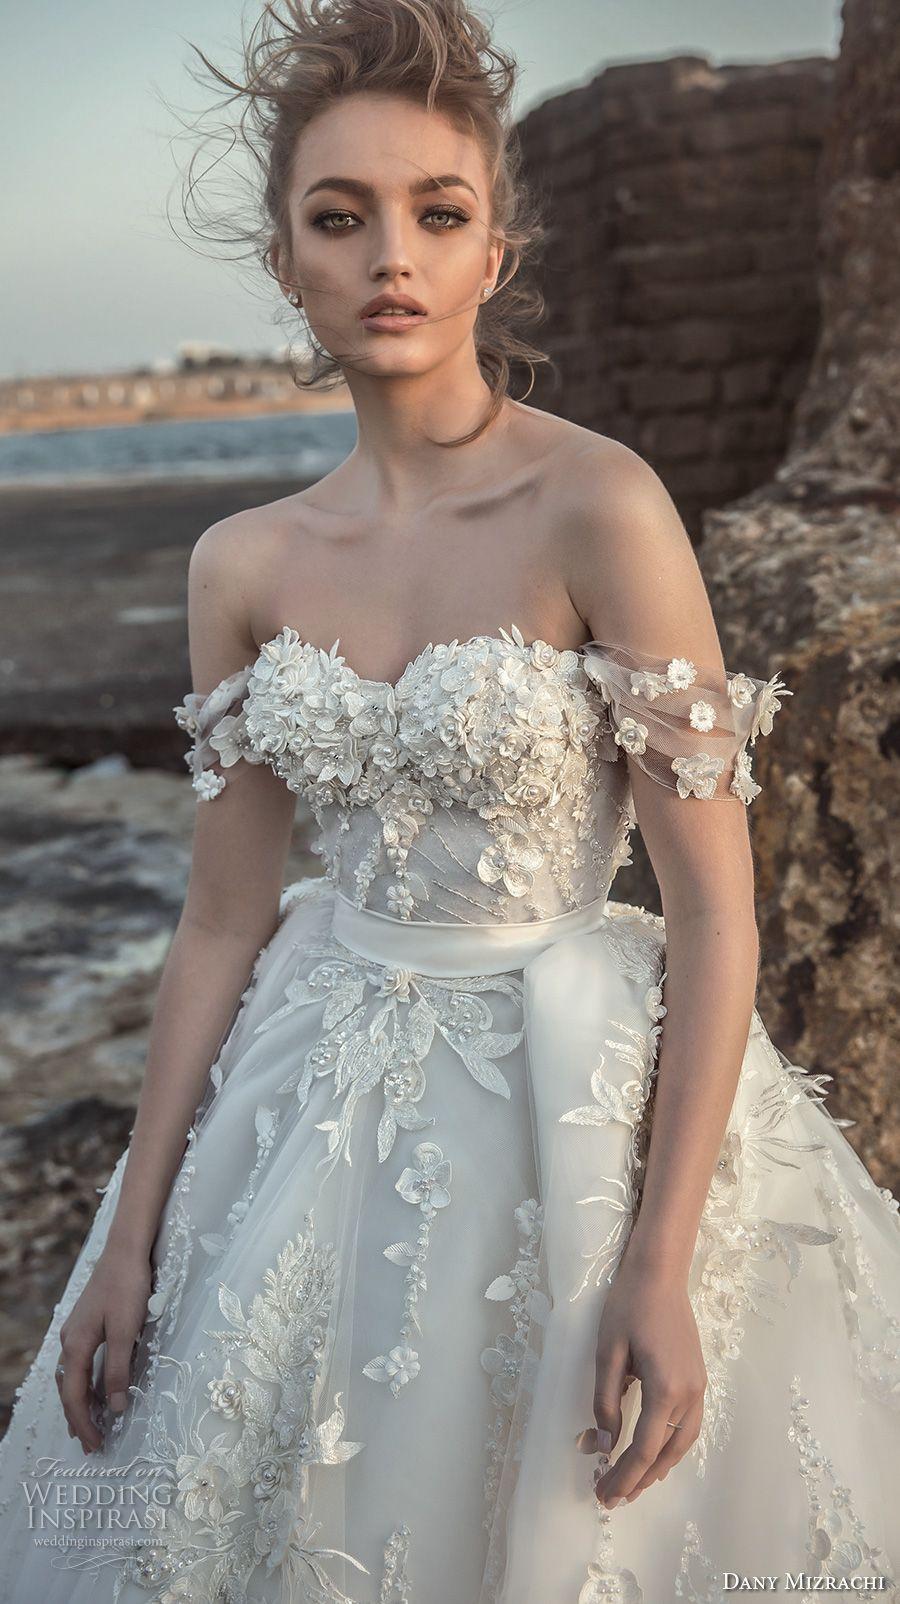 Danny Mizrachi 2018 Bridal Off The Shoulder Sweetheart Neckline Heavily Embellished Bodice Princess Ball Gown Wedding Dress 23 Mv Dany